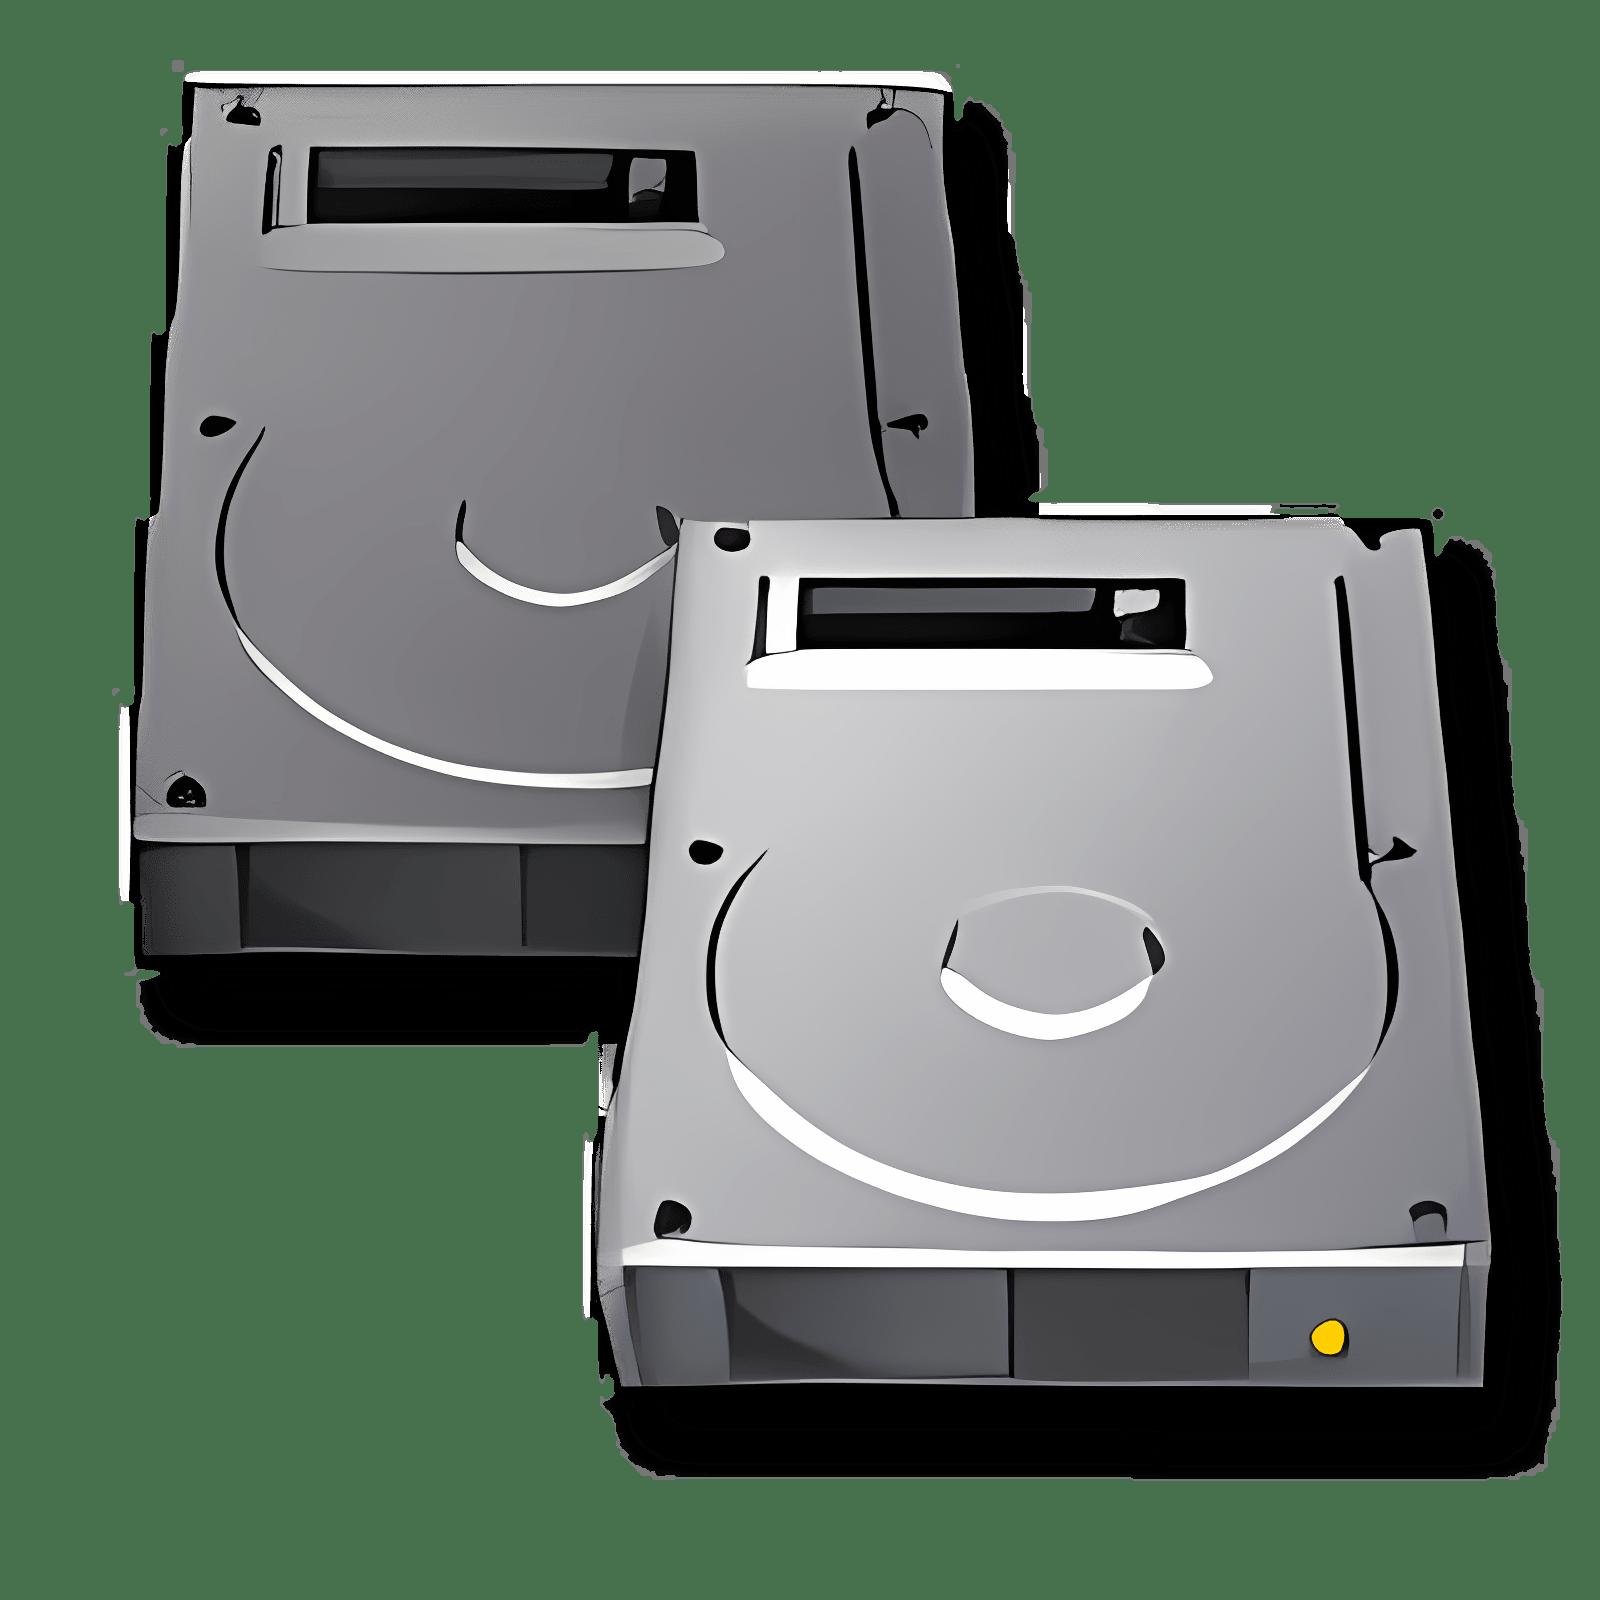 Carbon Copy Cloner (CCC) 3.5.7 (OS X 10.6 - 10.9)